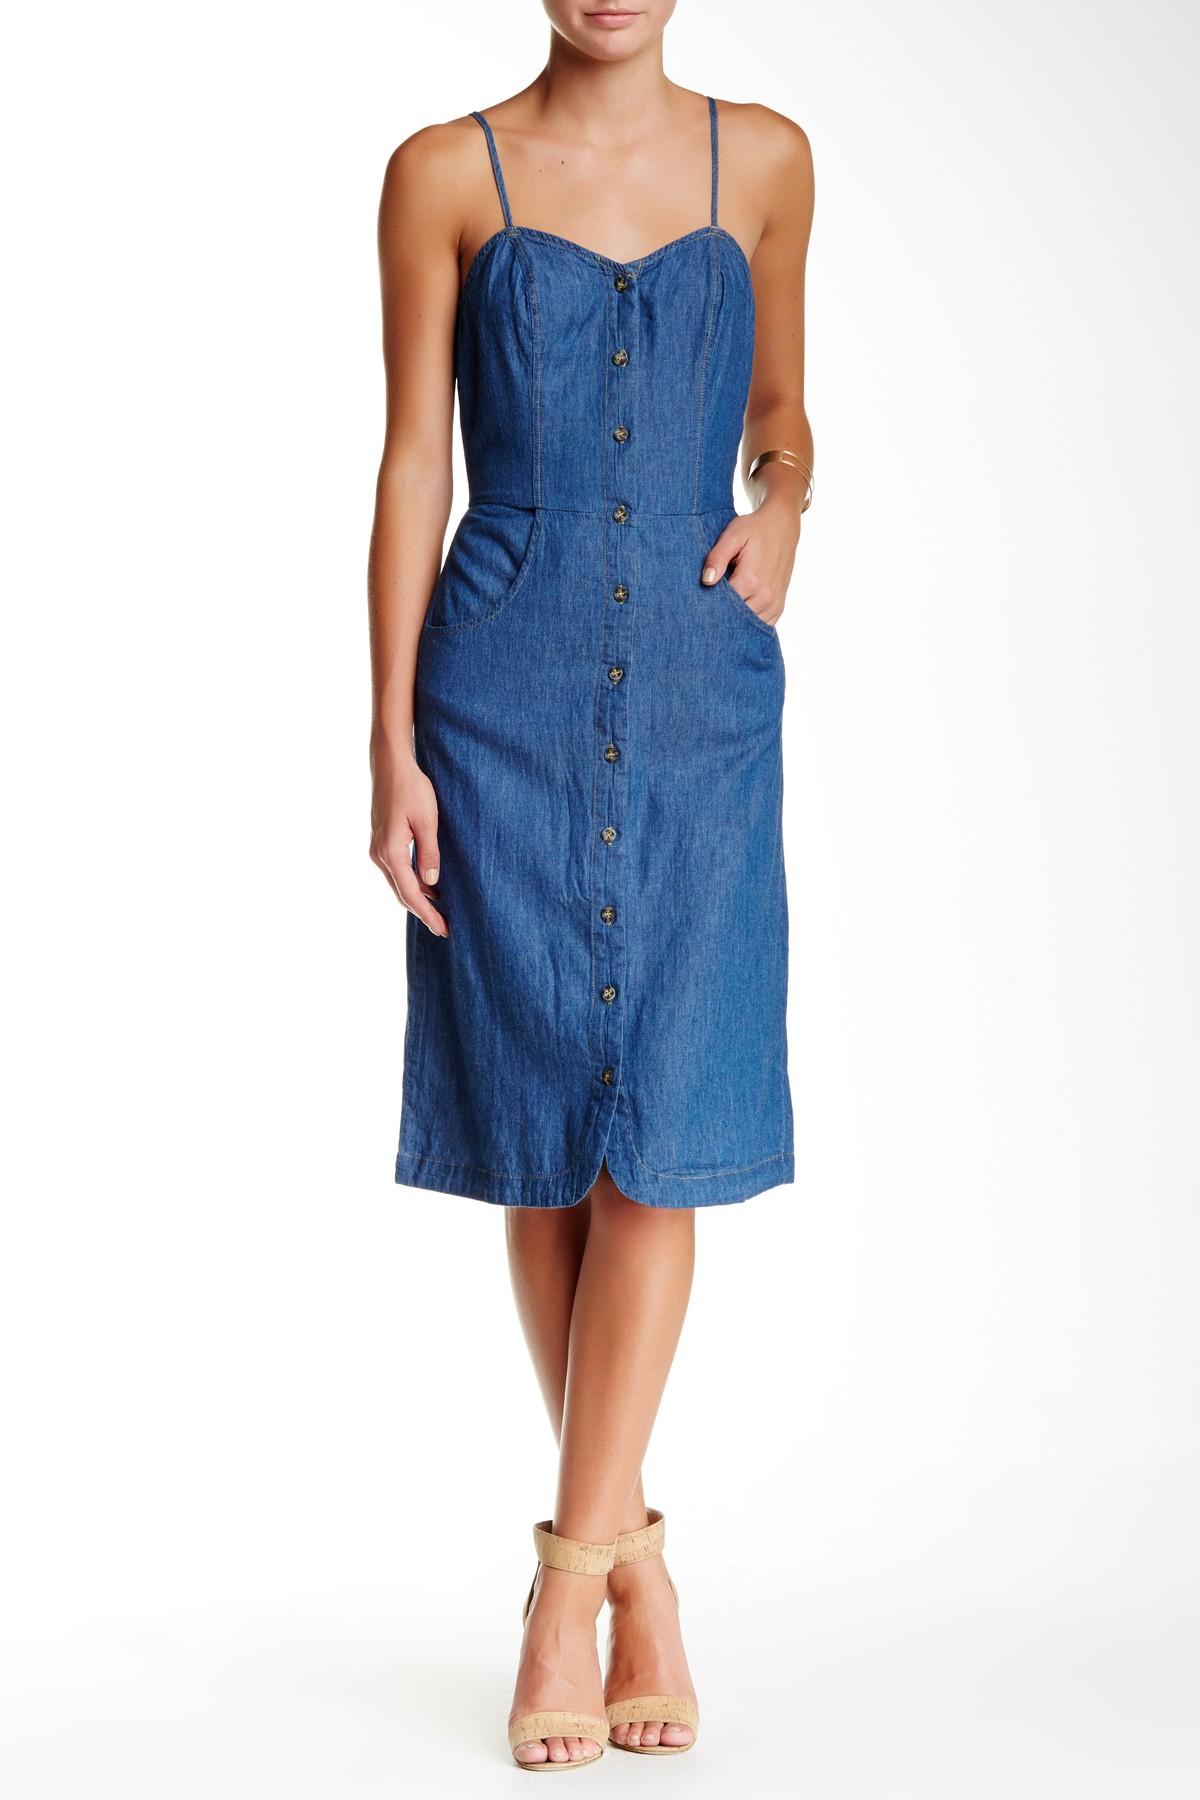 Lyst Mimi Chica Spaghetti Strap Denim Button Down Dress